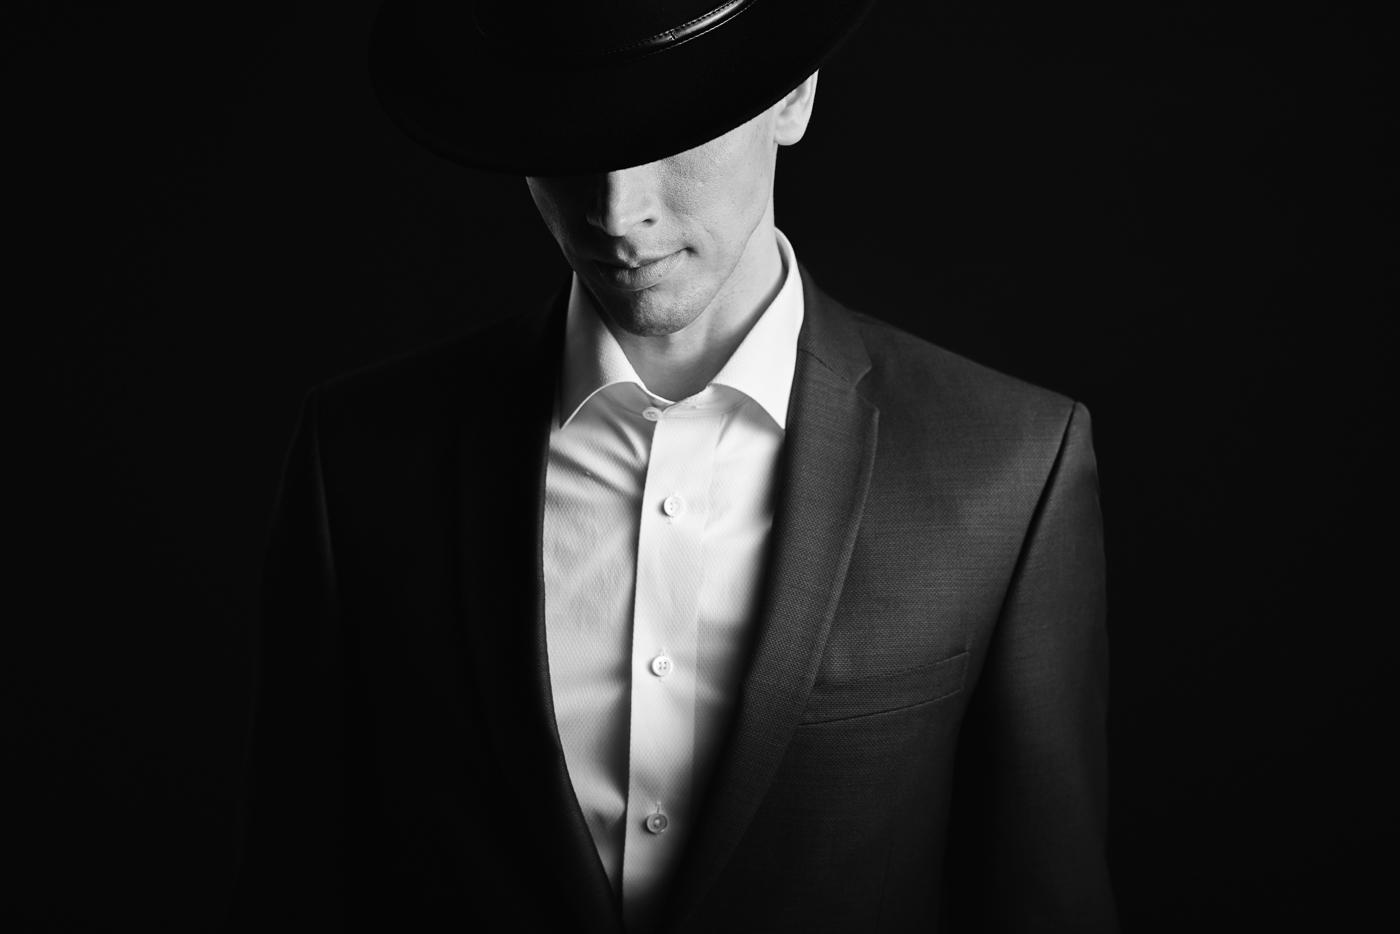 portreefoto portreed fotograaf Kristian Kruuser-10.jpg